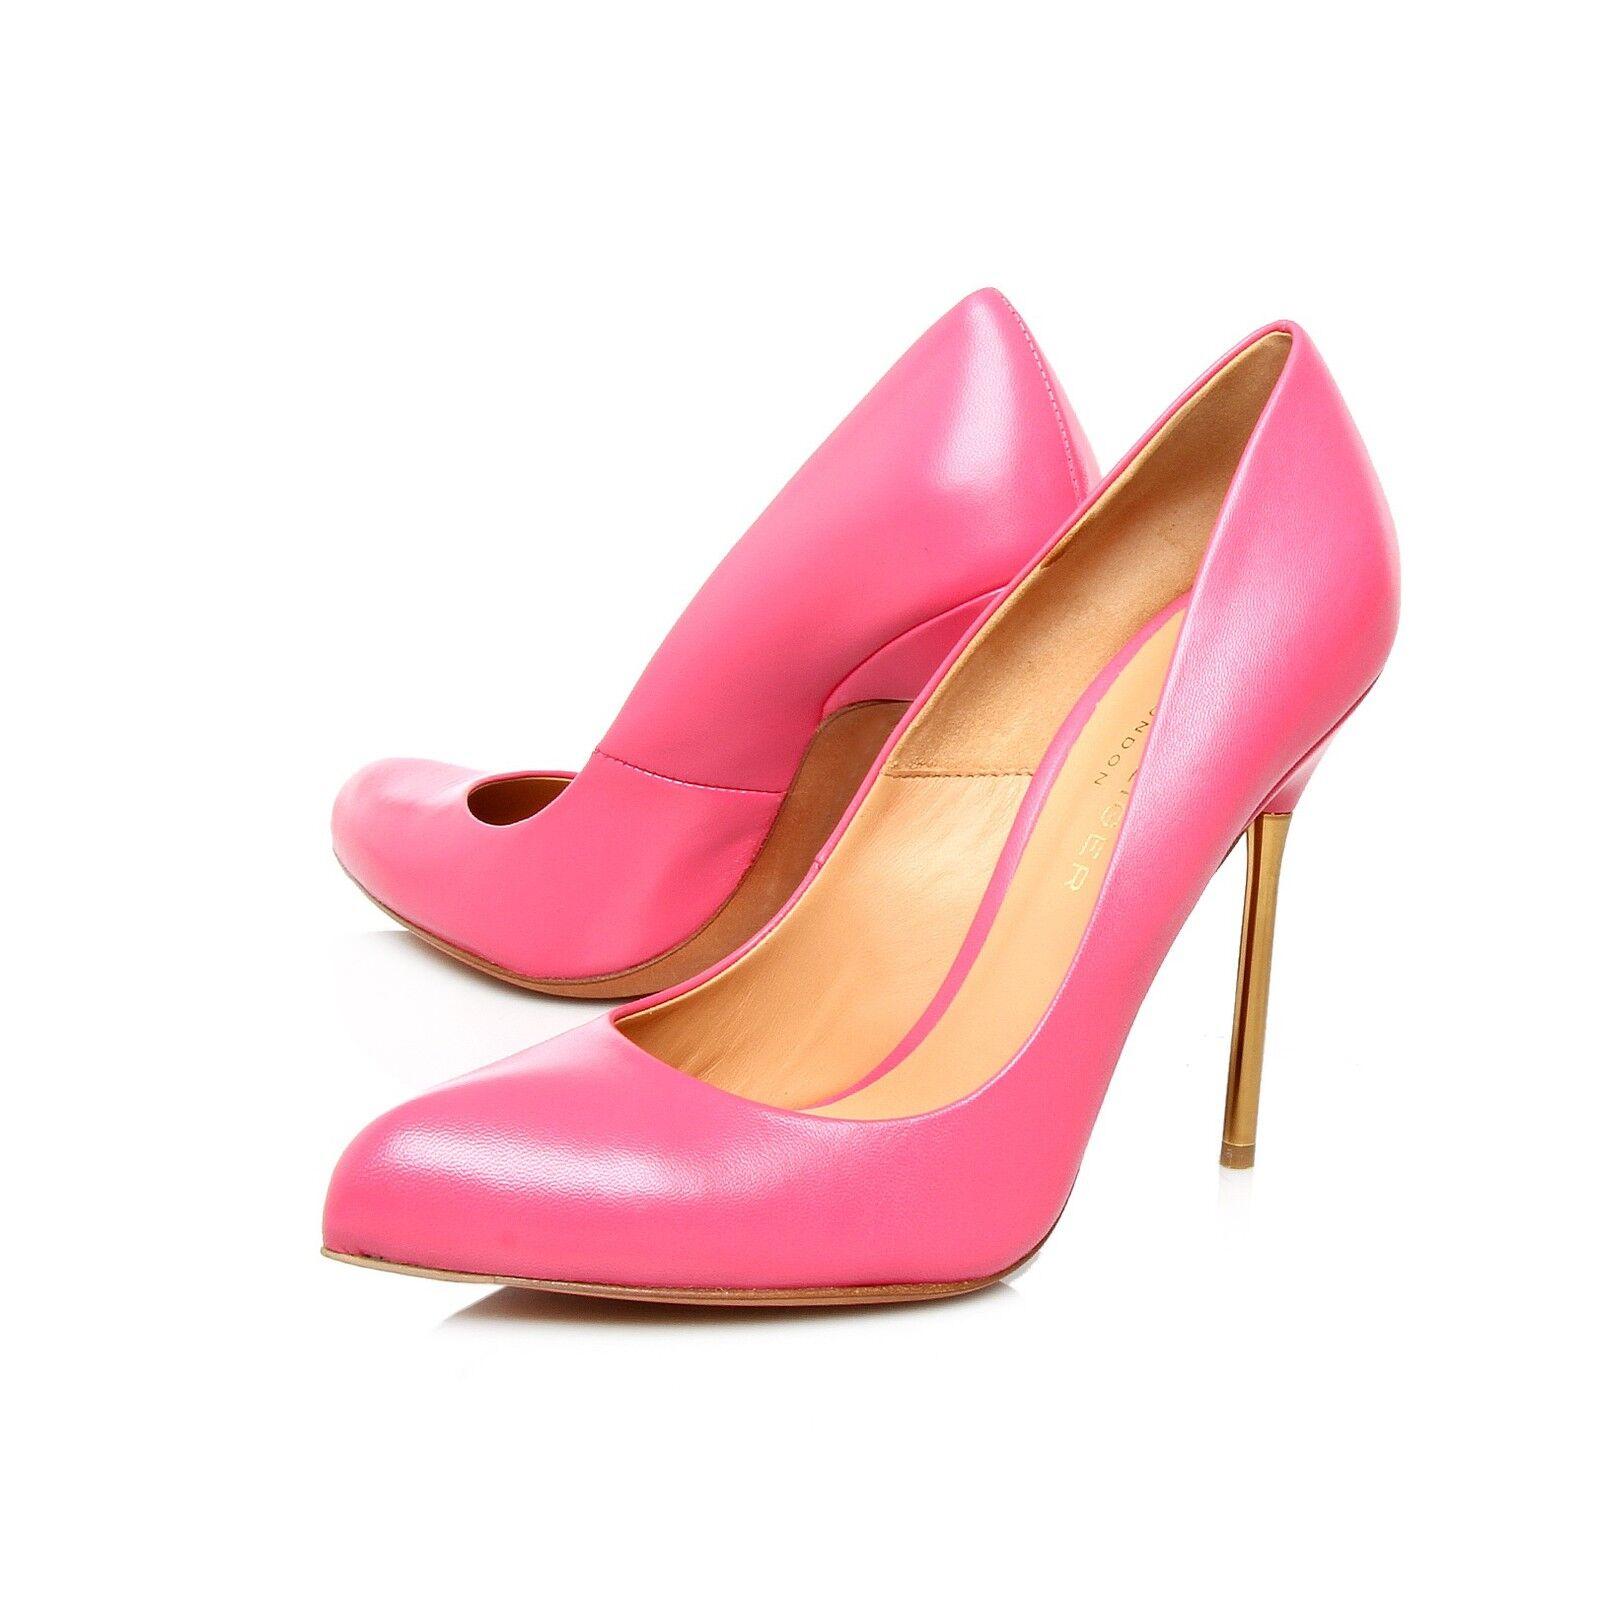 Nuevo Kurt Kurt Kurt Geiger Ébano Britton Elliot B Serie Hot rosadododo Tacones Zapatos 8 41 10  el mas reciente